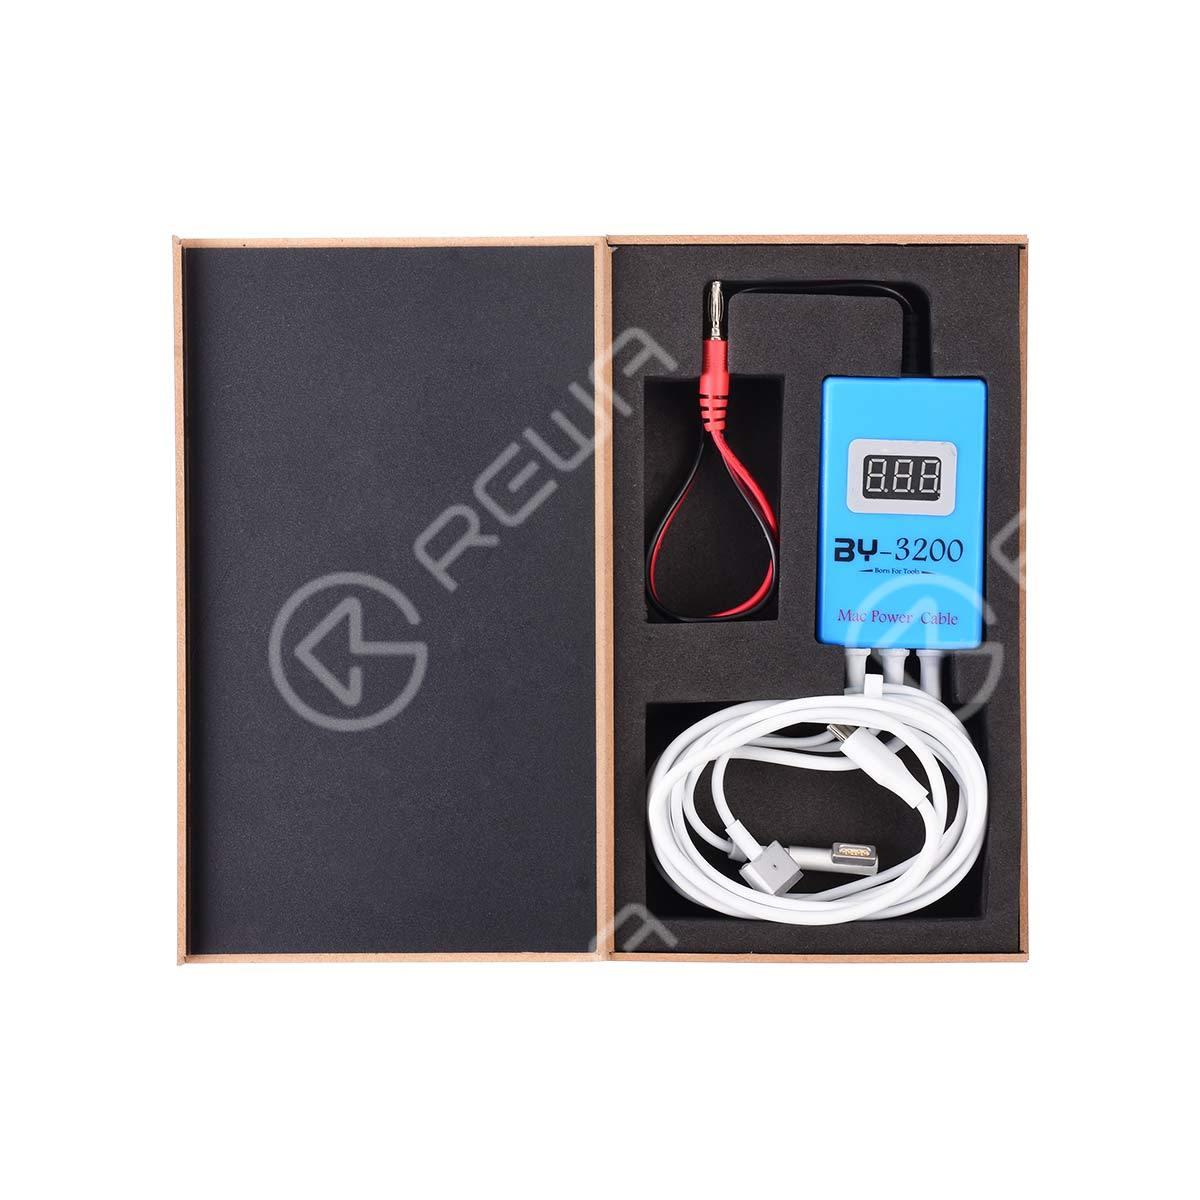 BAIYI BY-3200 Mac 3 In 1 Power Cable For MacBook Repair